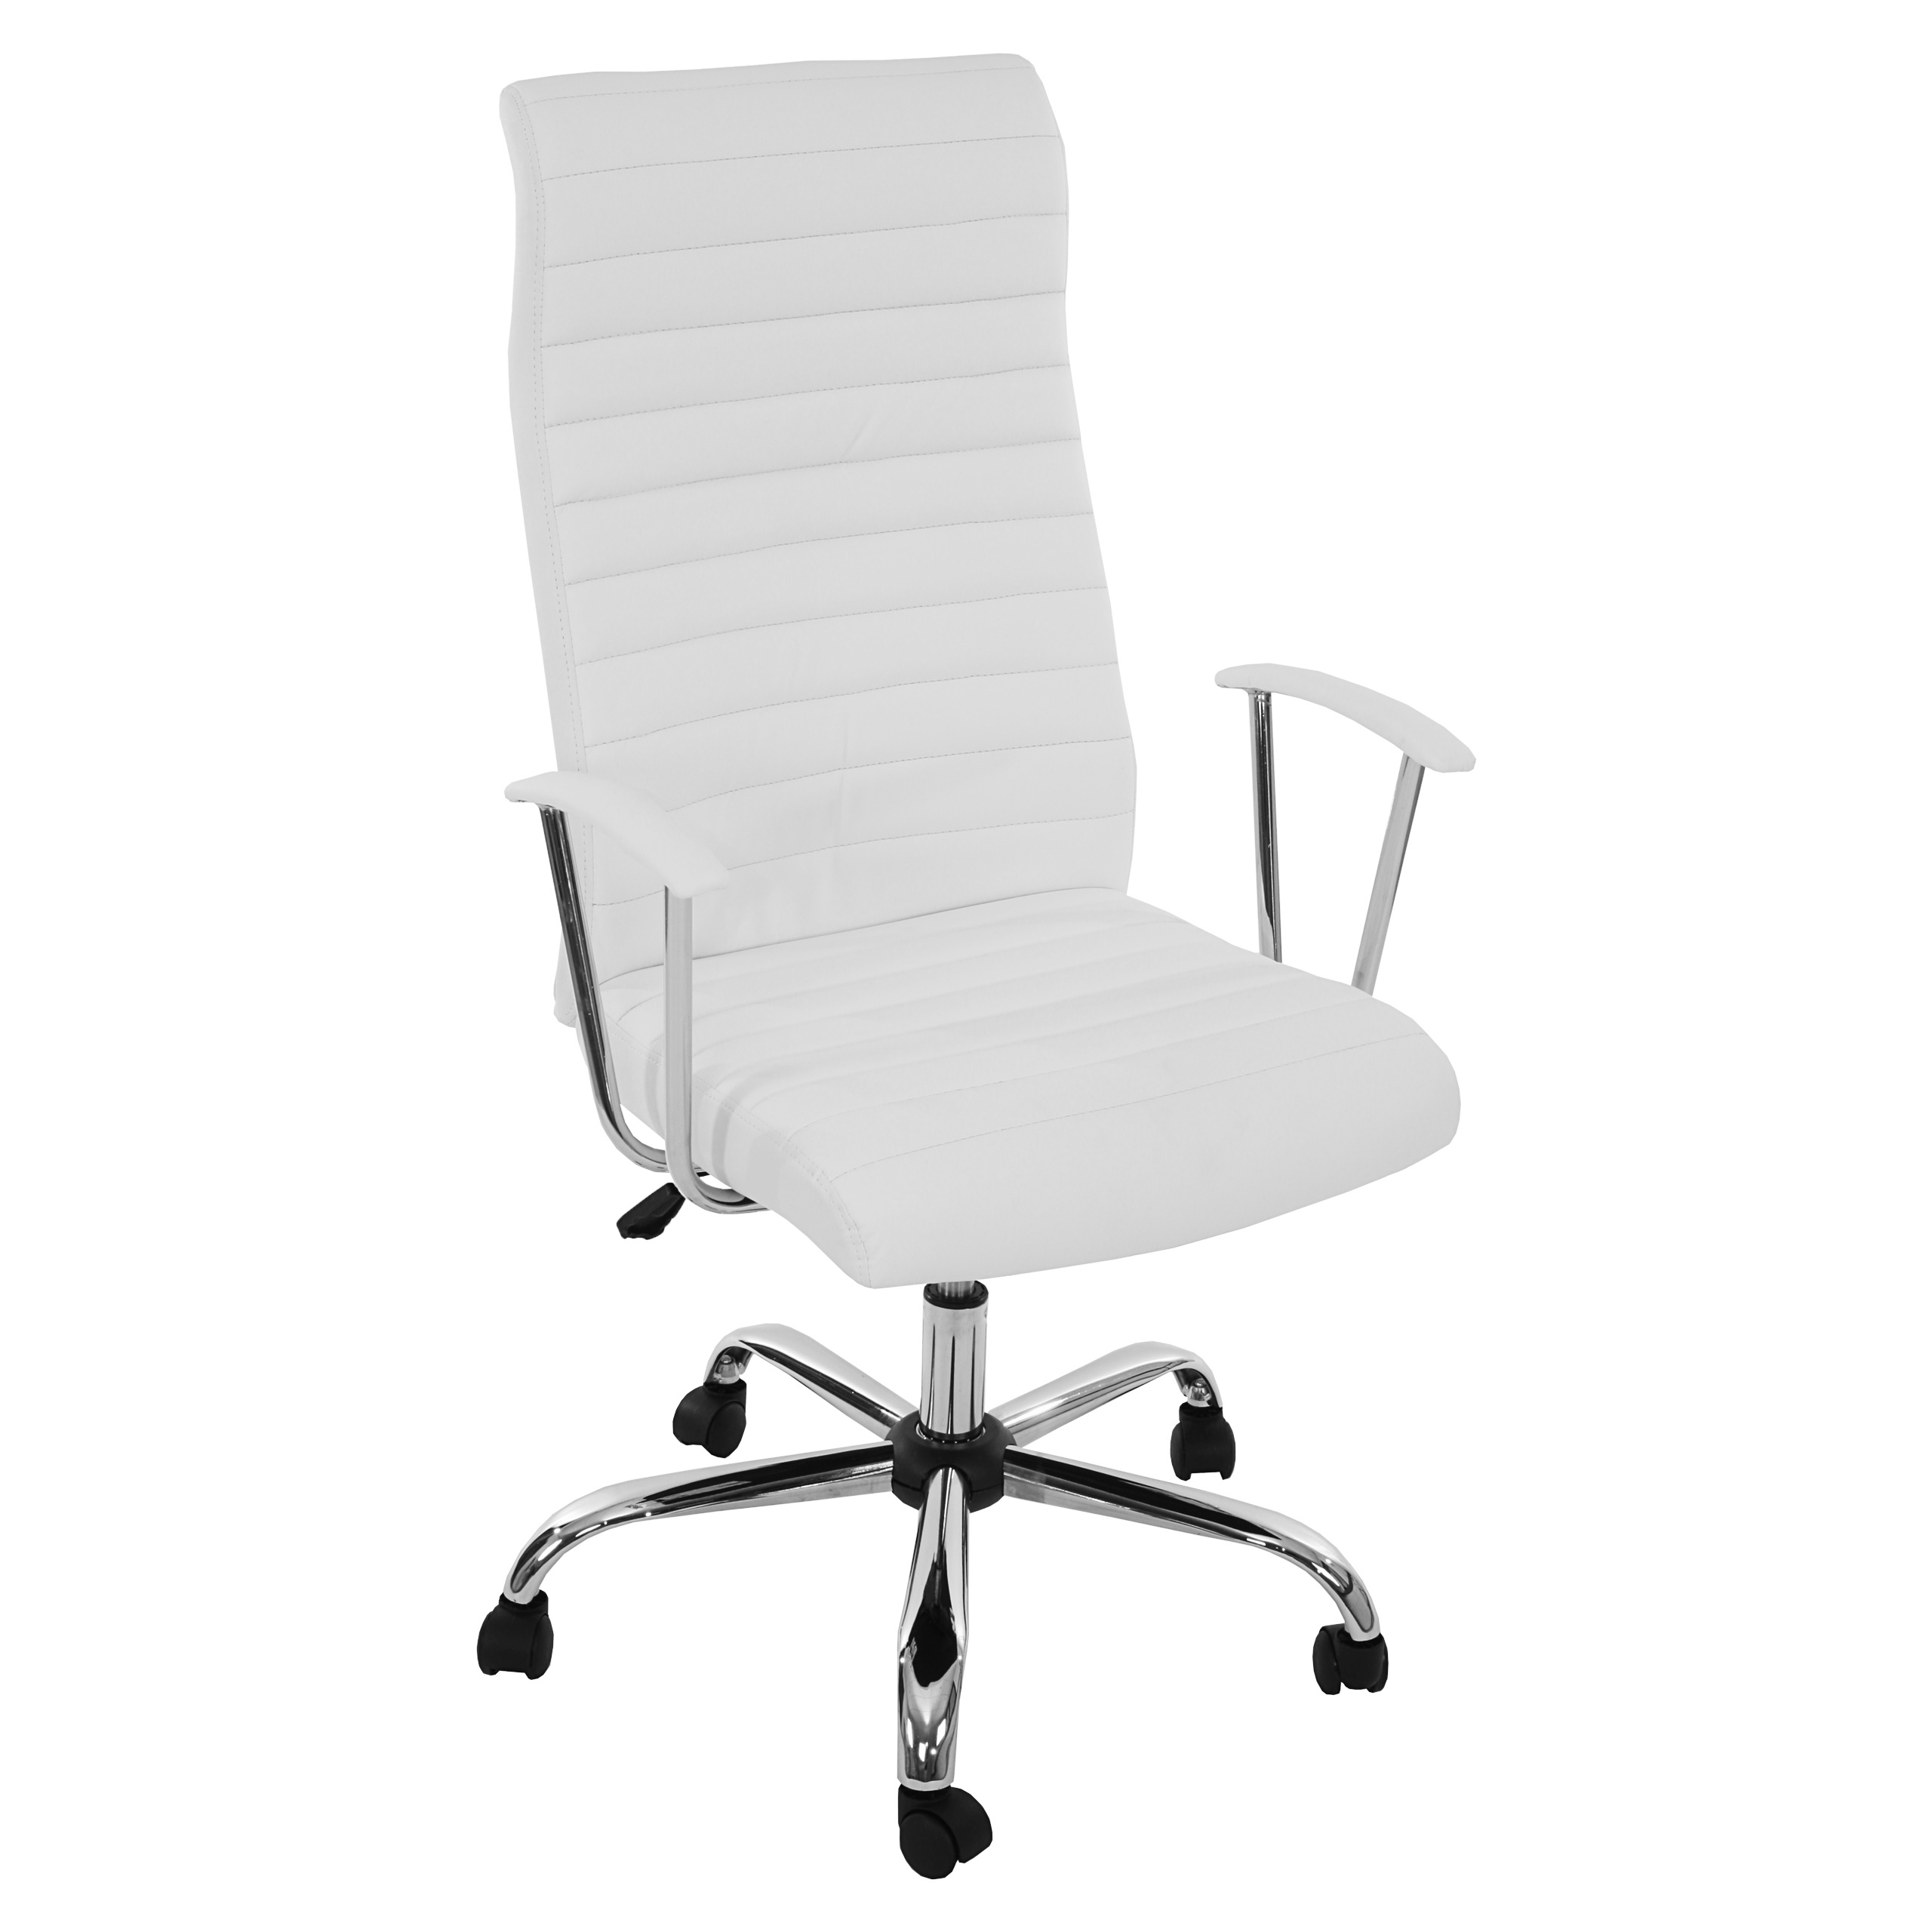 Bürostuhl weiß  Bürostuhl Drehstuhl Chefsessel Cagliari, ergonomische Form ~ weiss ...